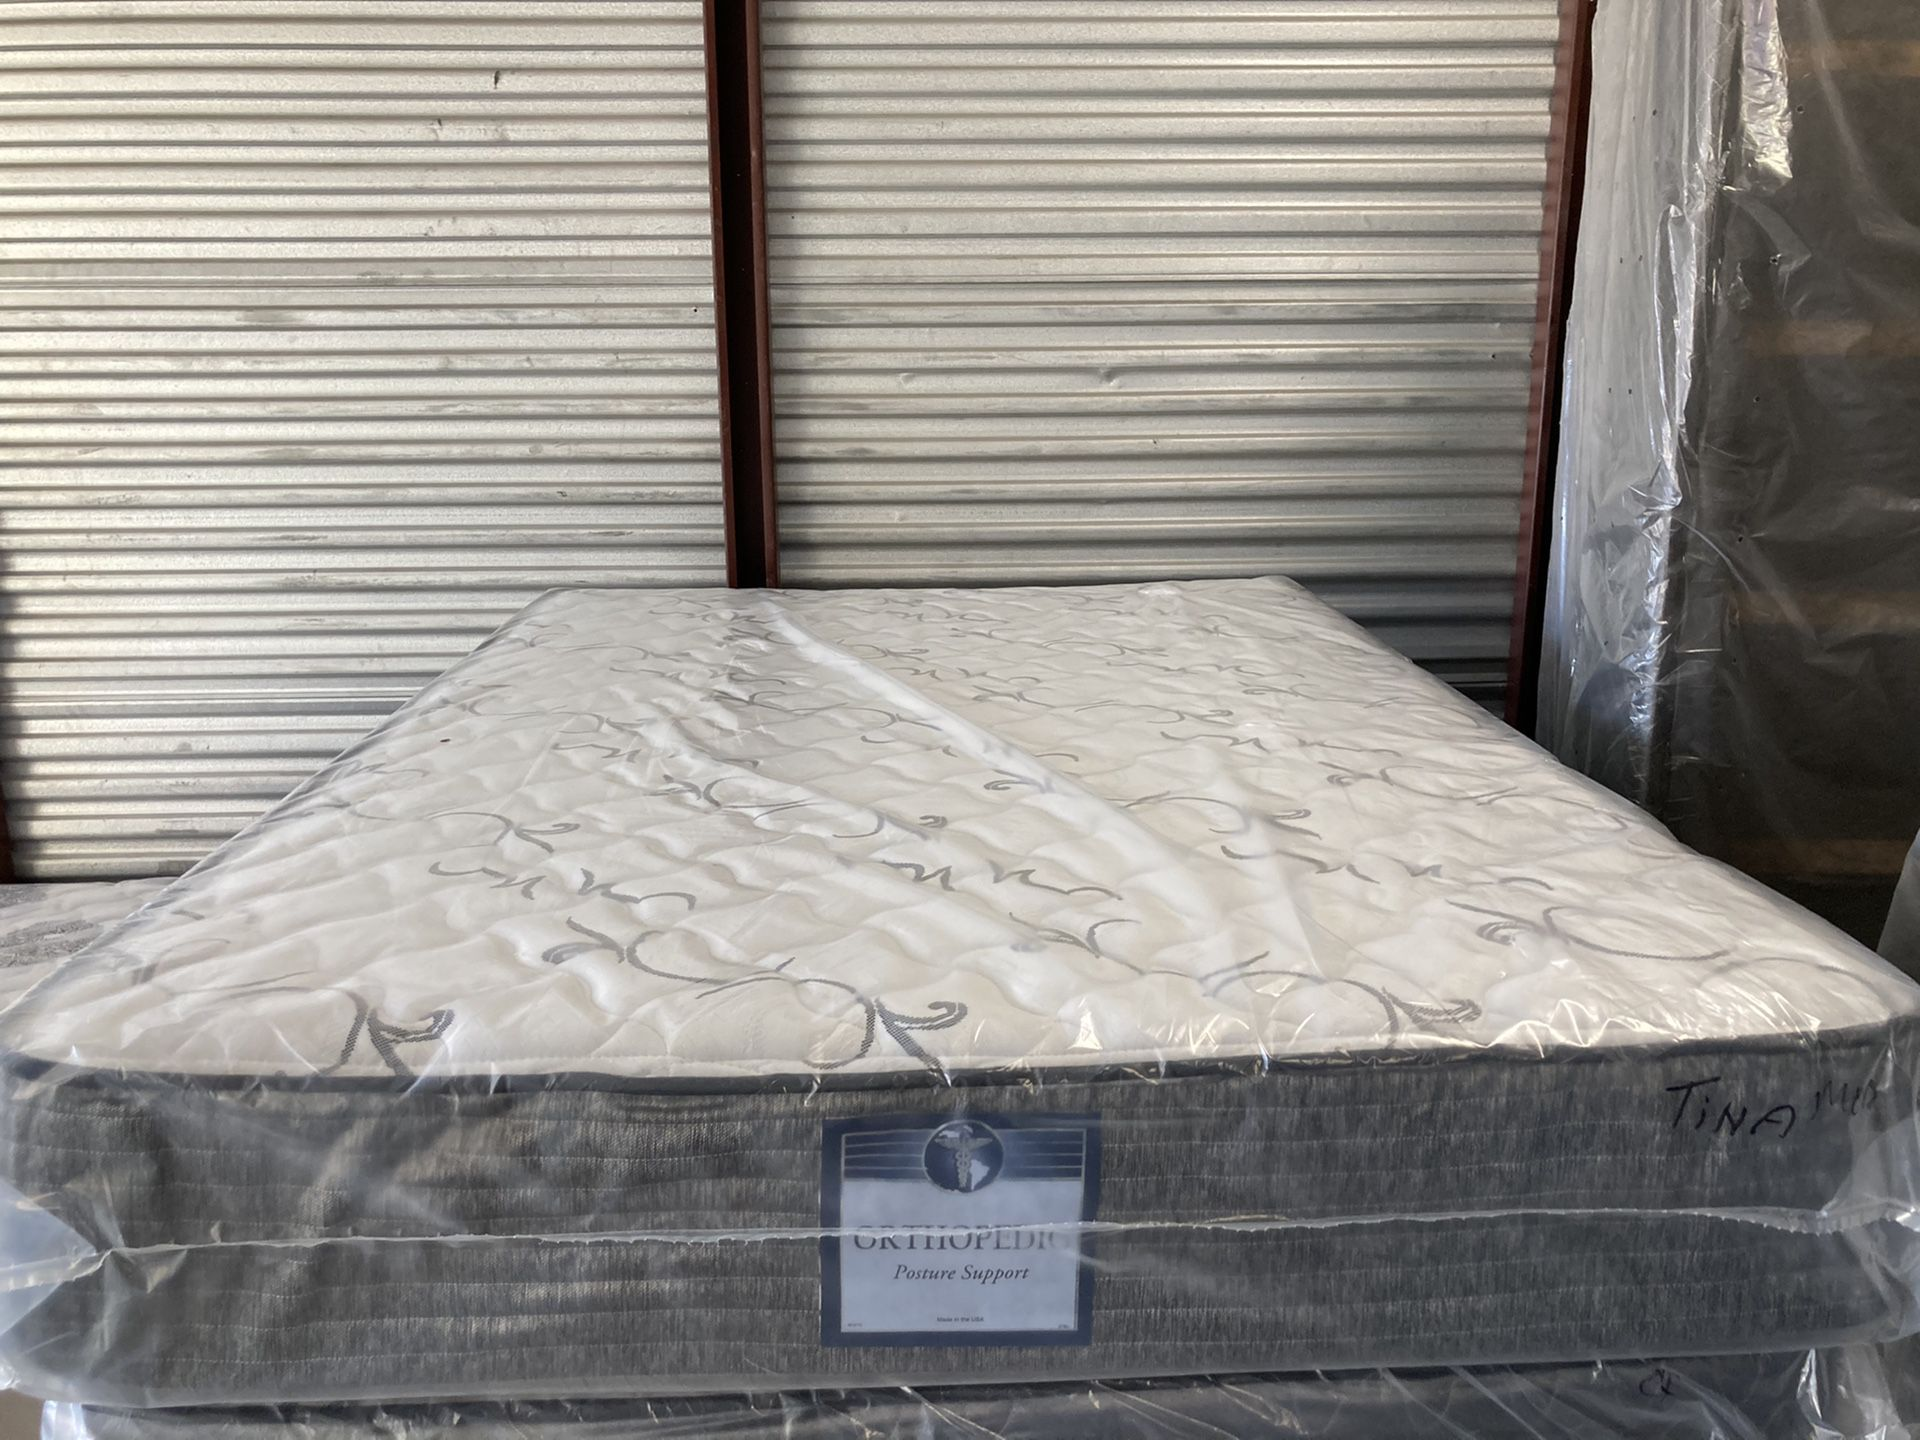 New full deluxe medium feel mattress and box spring